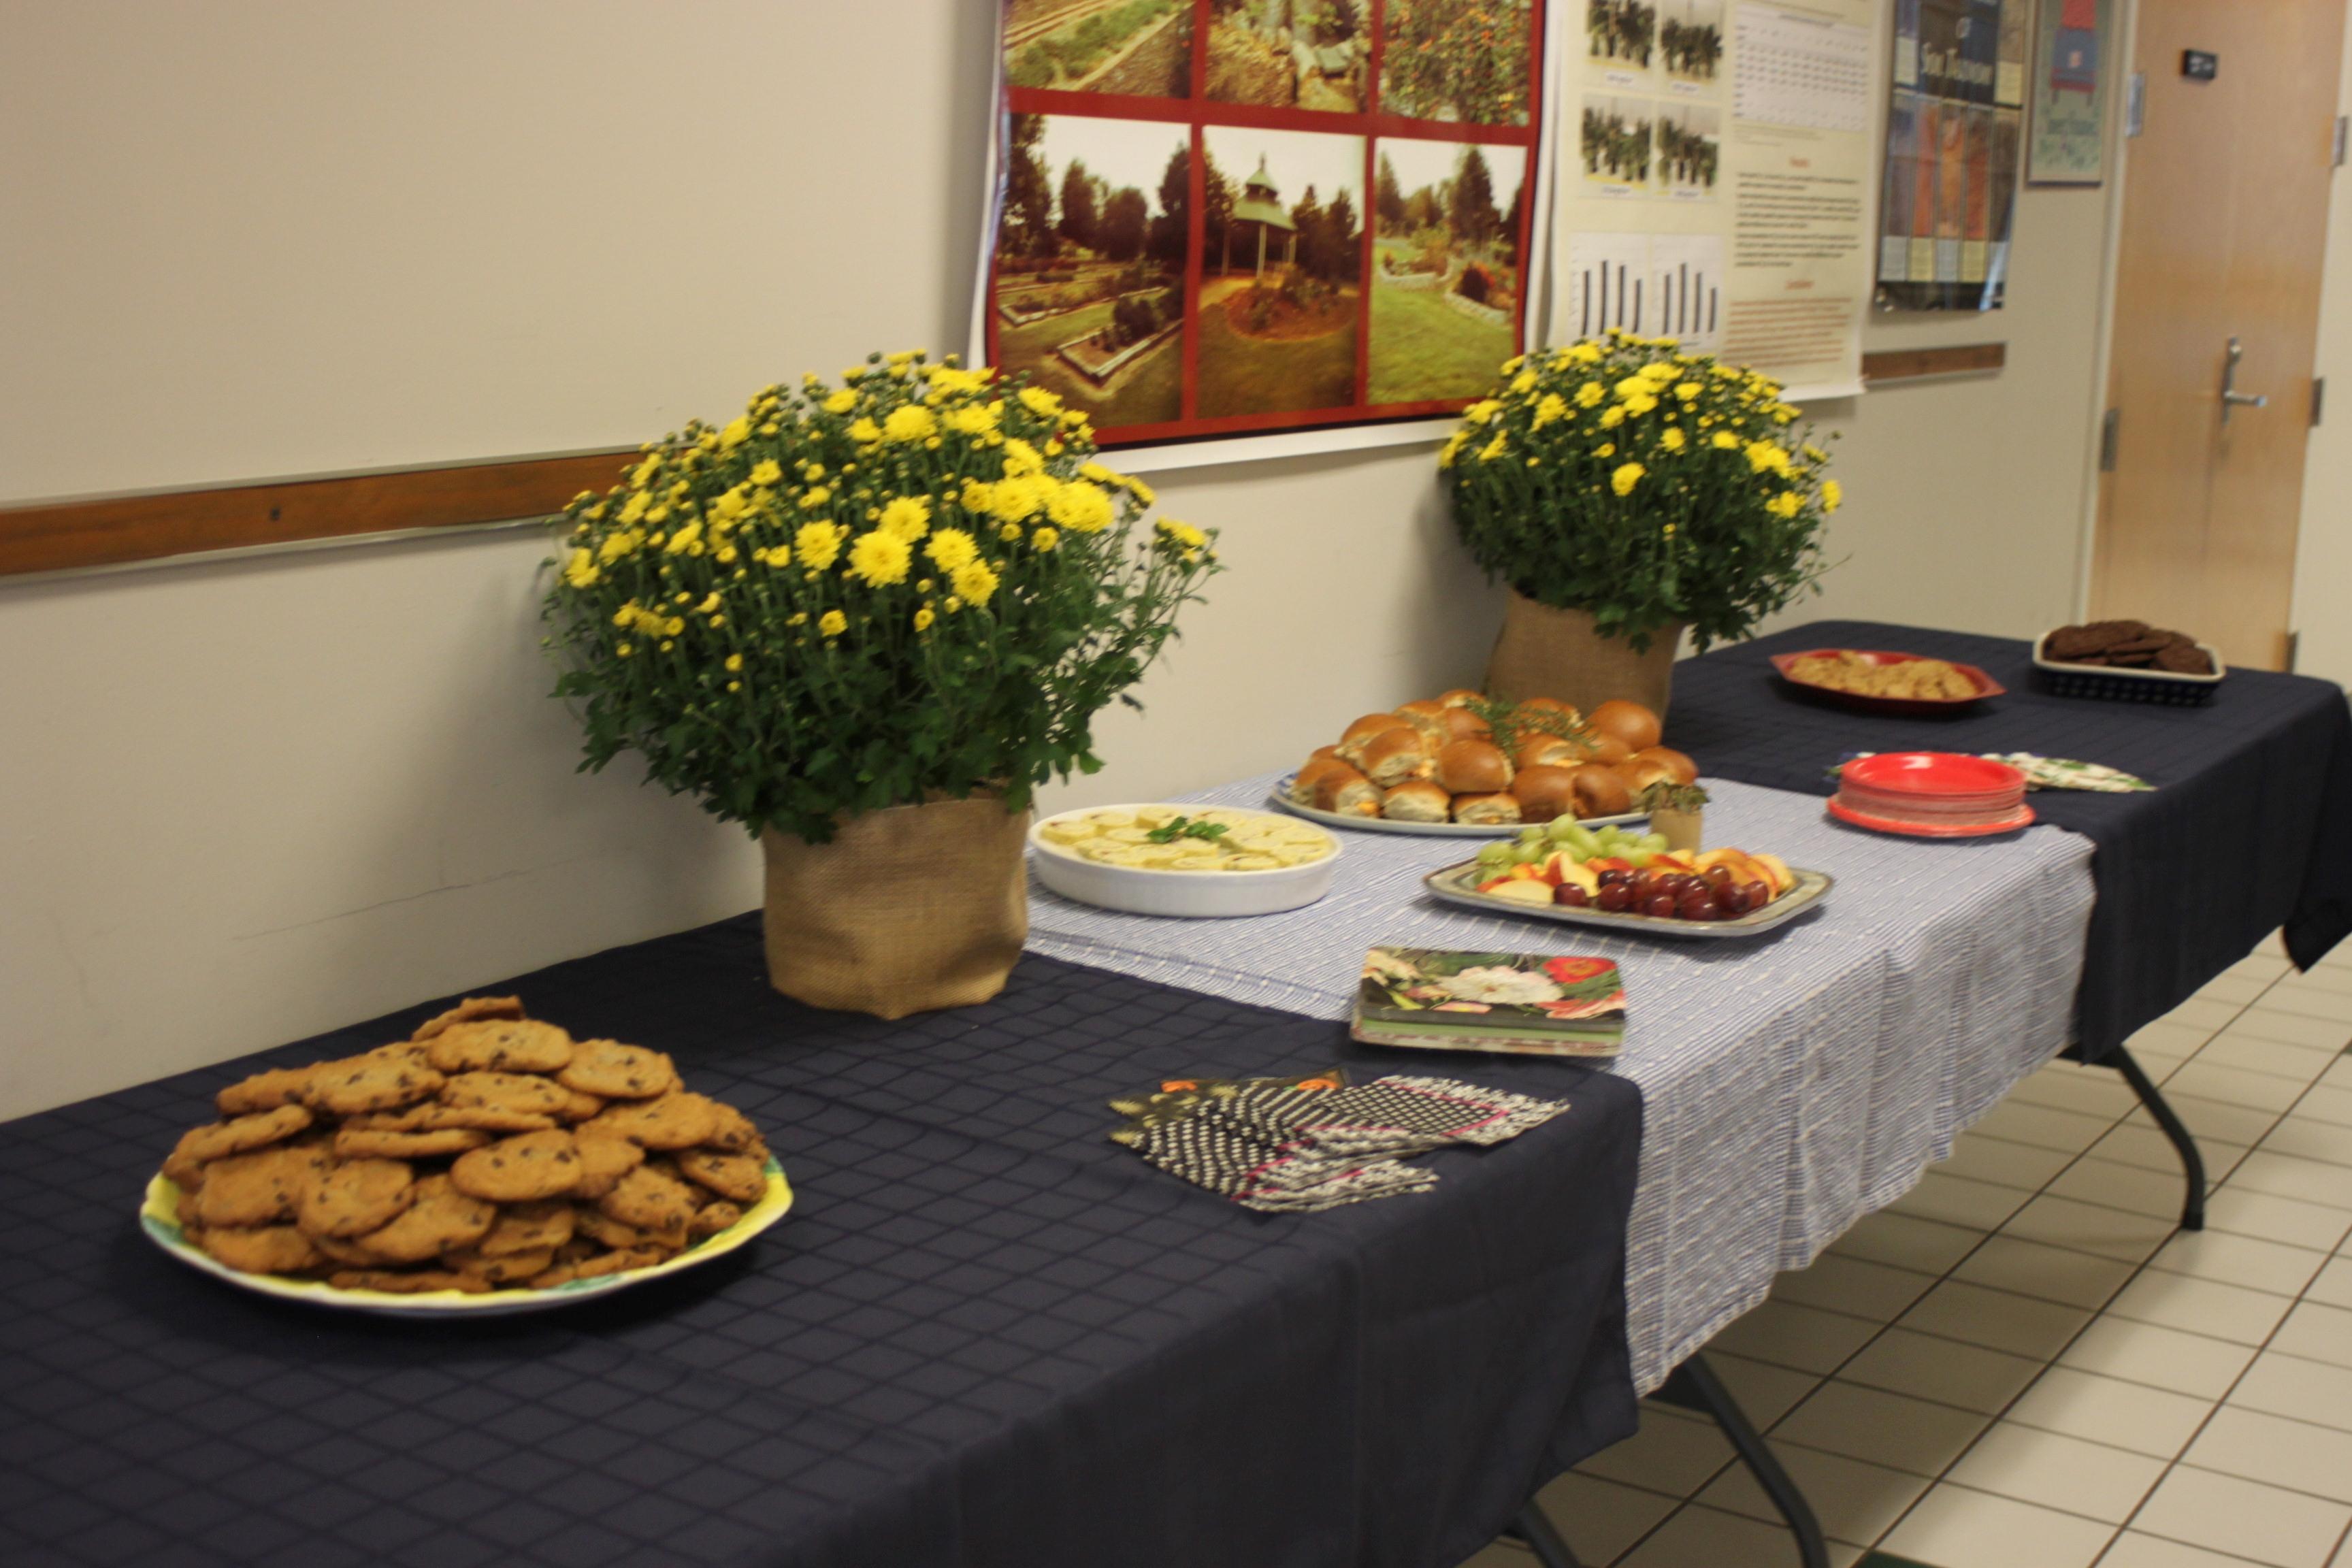 northeast ms rose society celebrates fall garden design